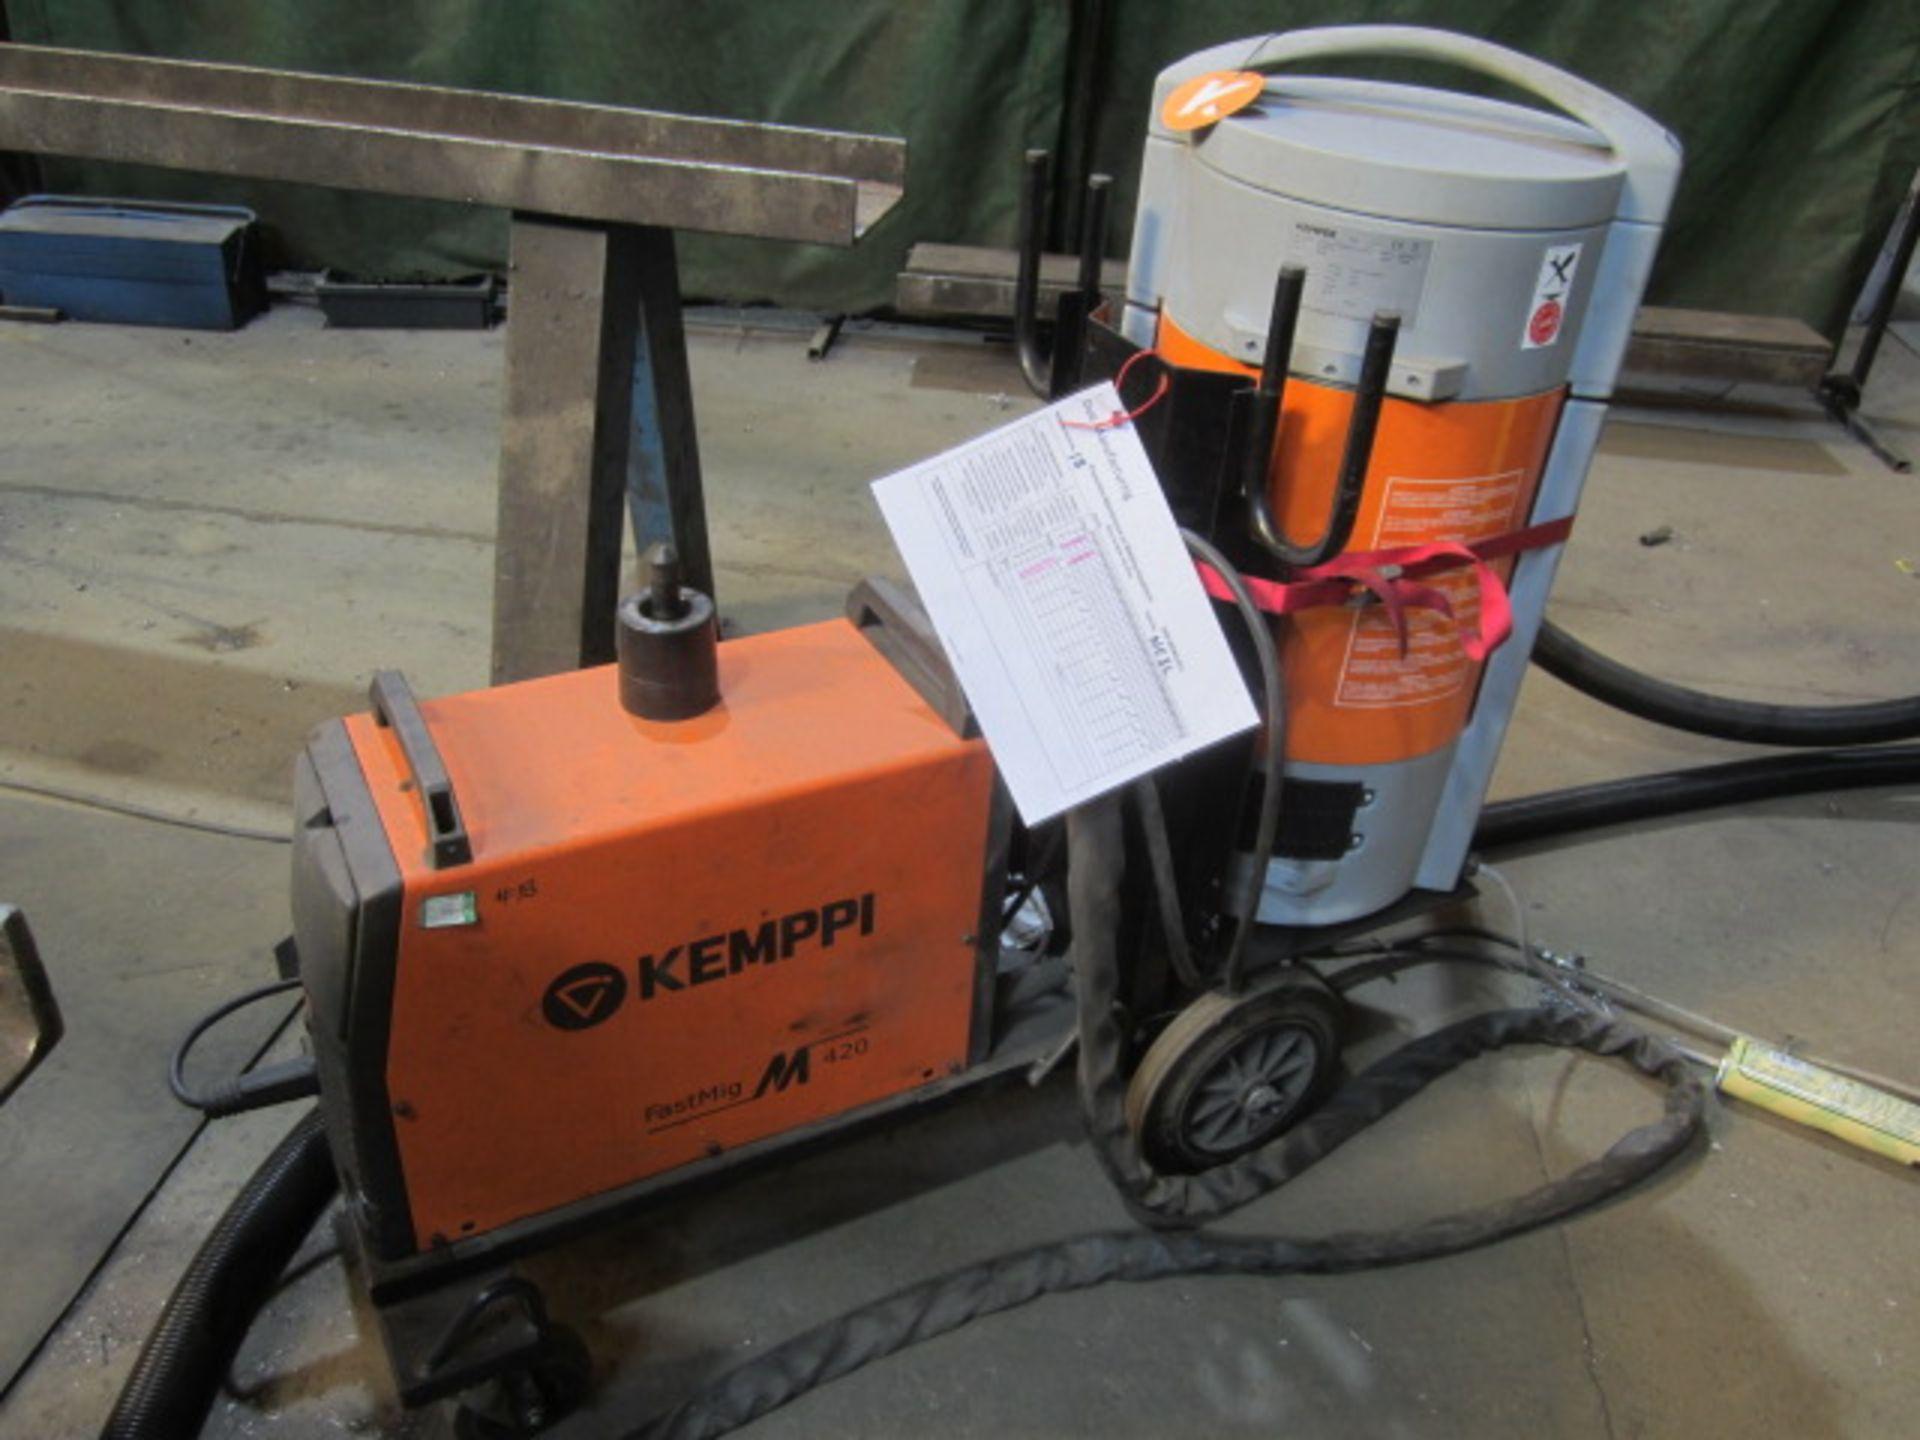 Kemppi Fast Mig M420 mig welder, serial no. 2673739, with Fast Mig MXF65 wire feeder, serial no.